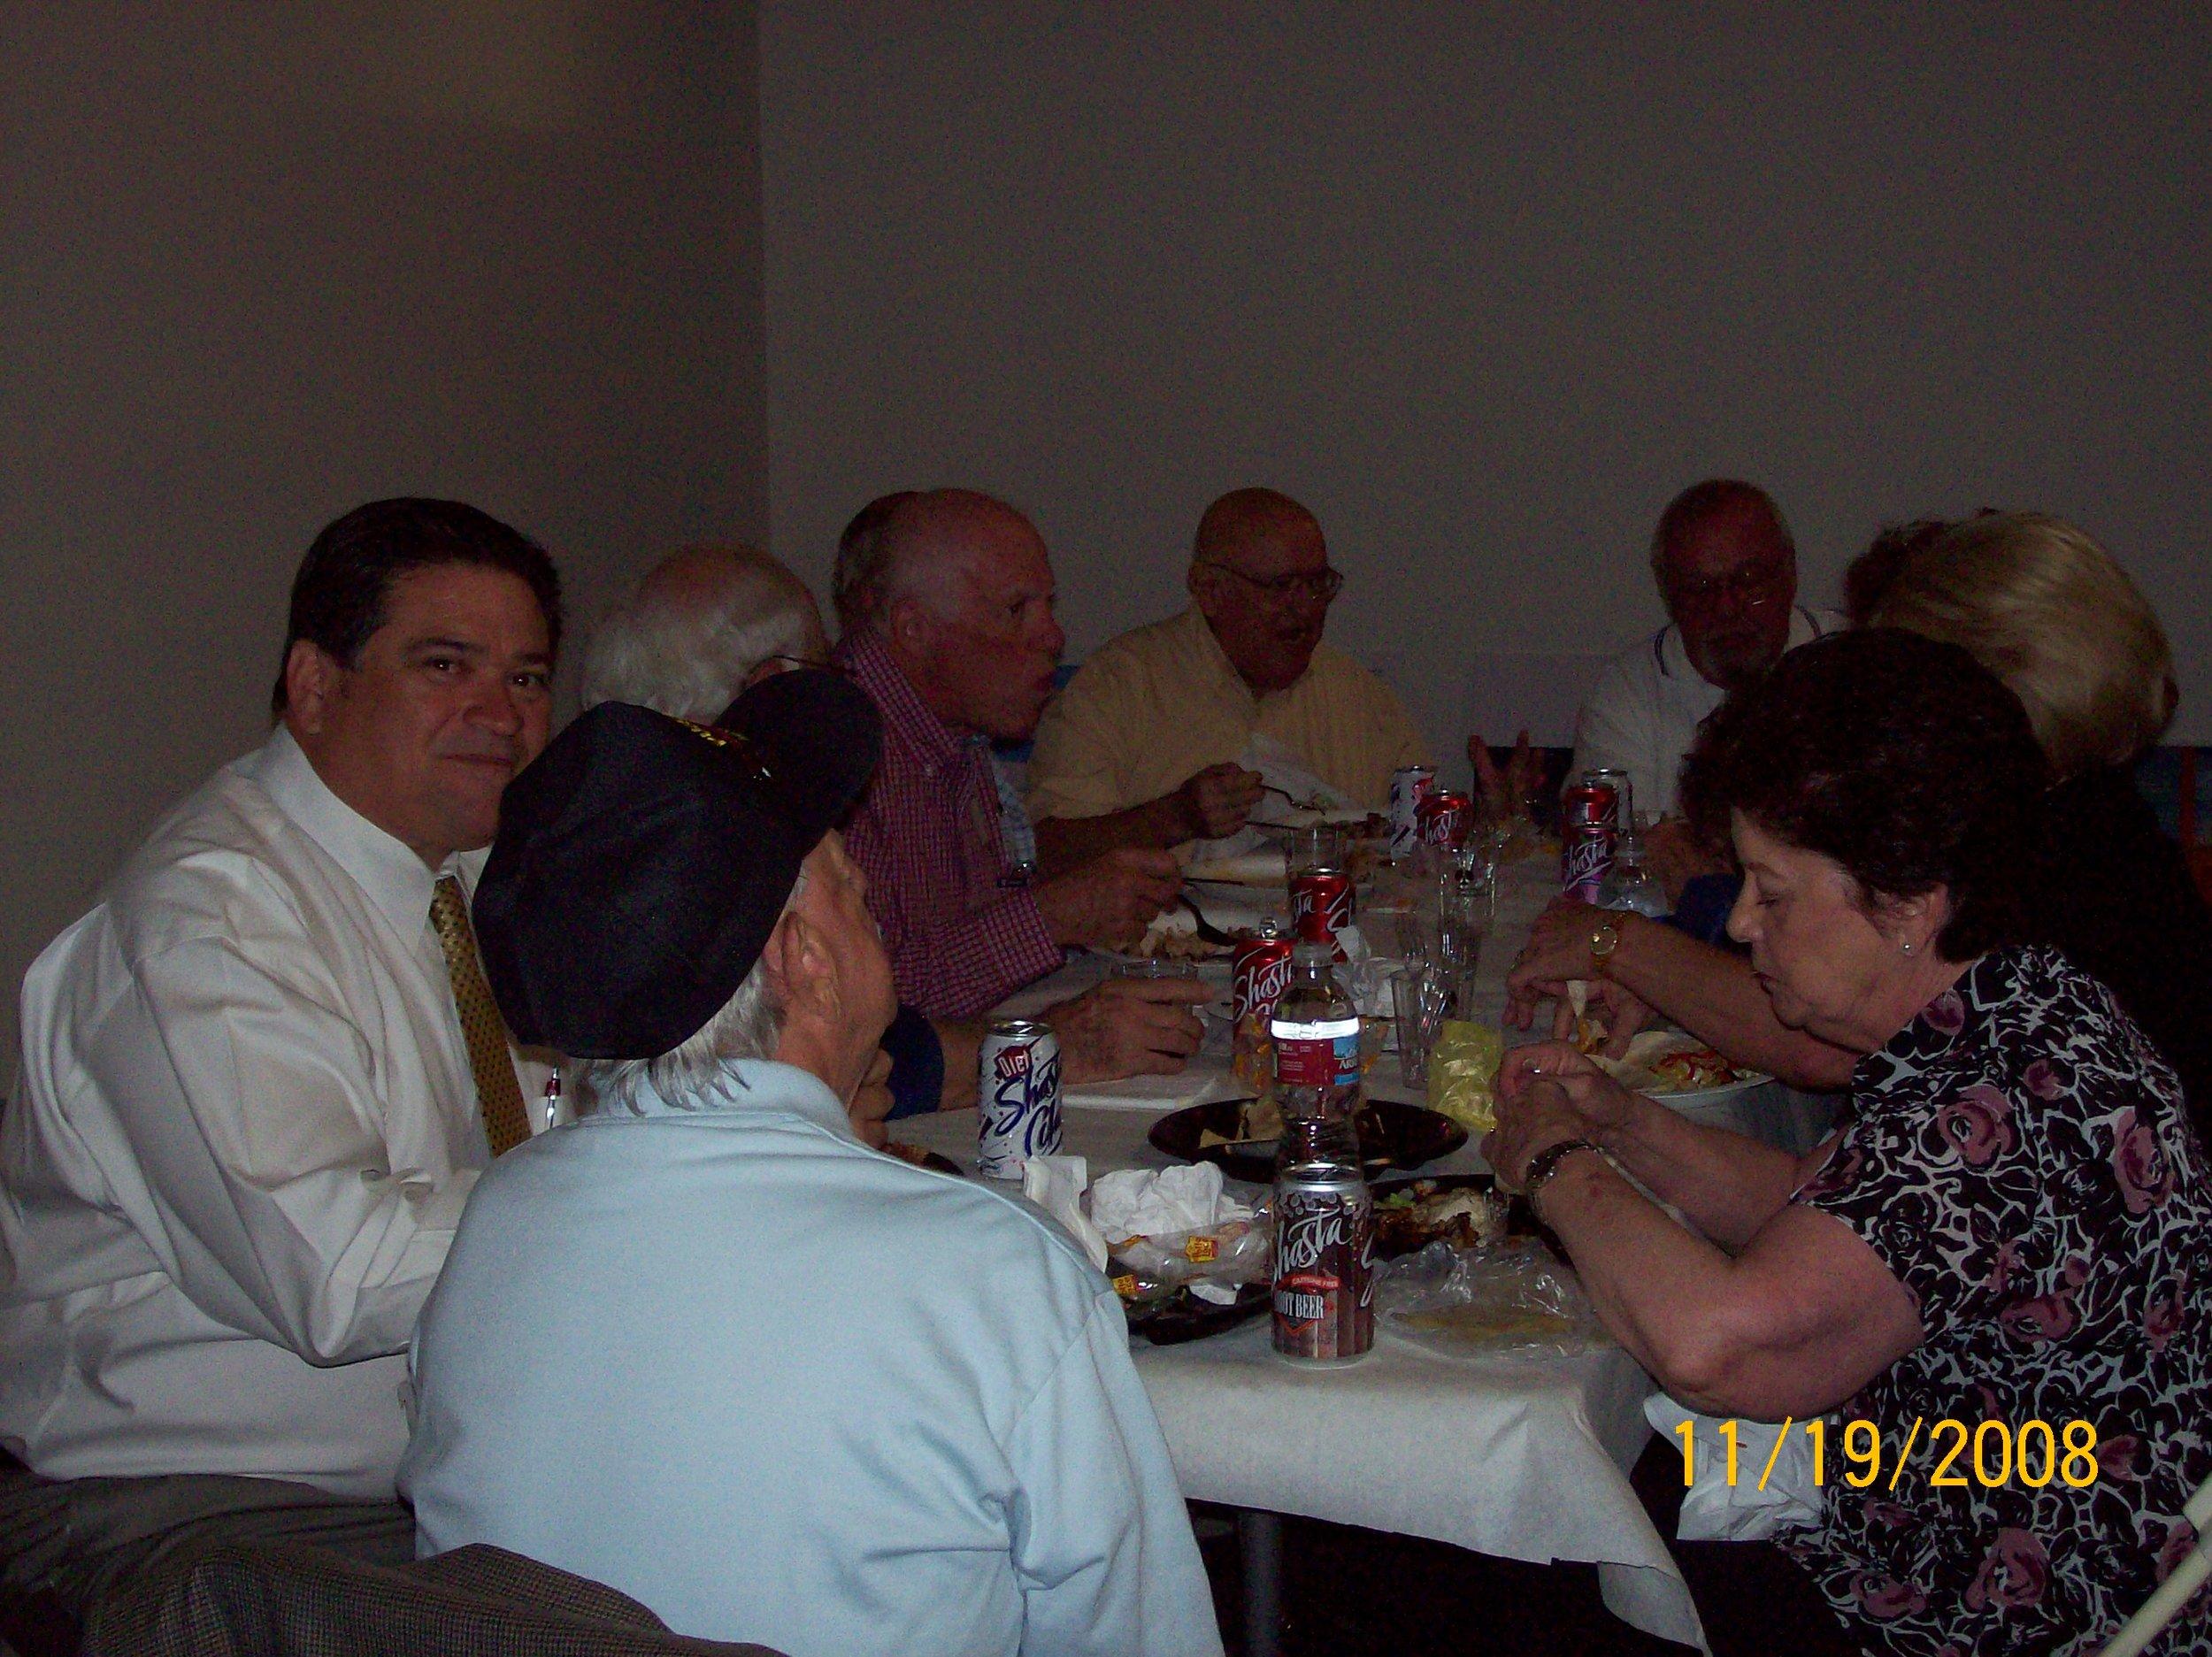 alf luncheon 11 19 2008 036.jpg